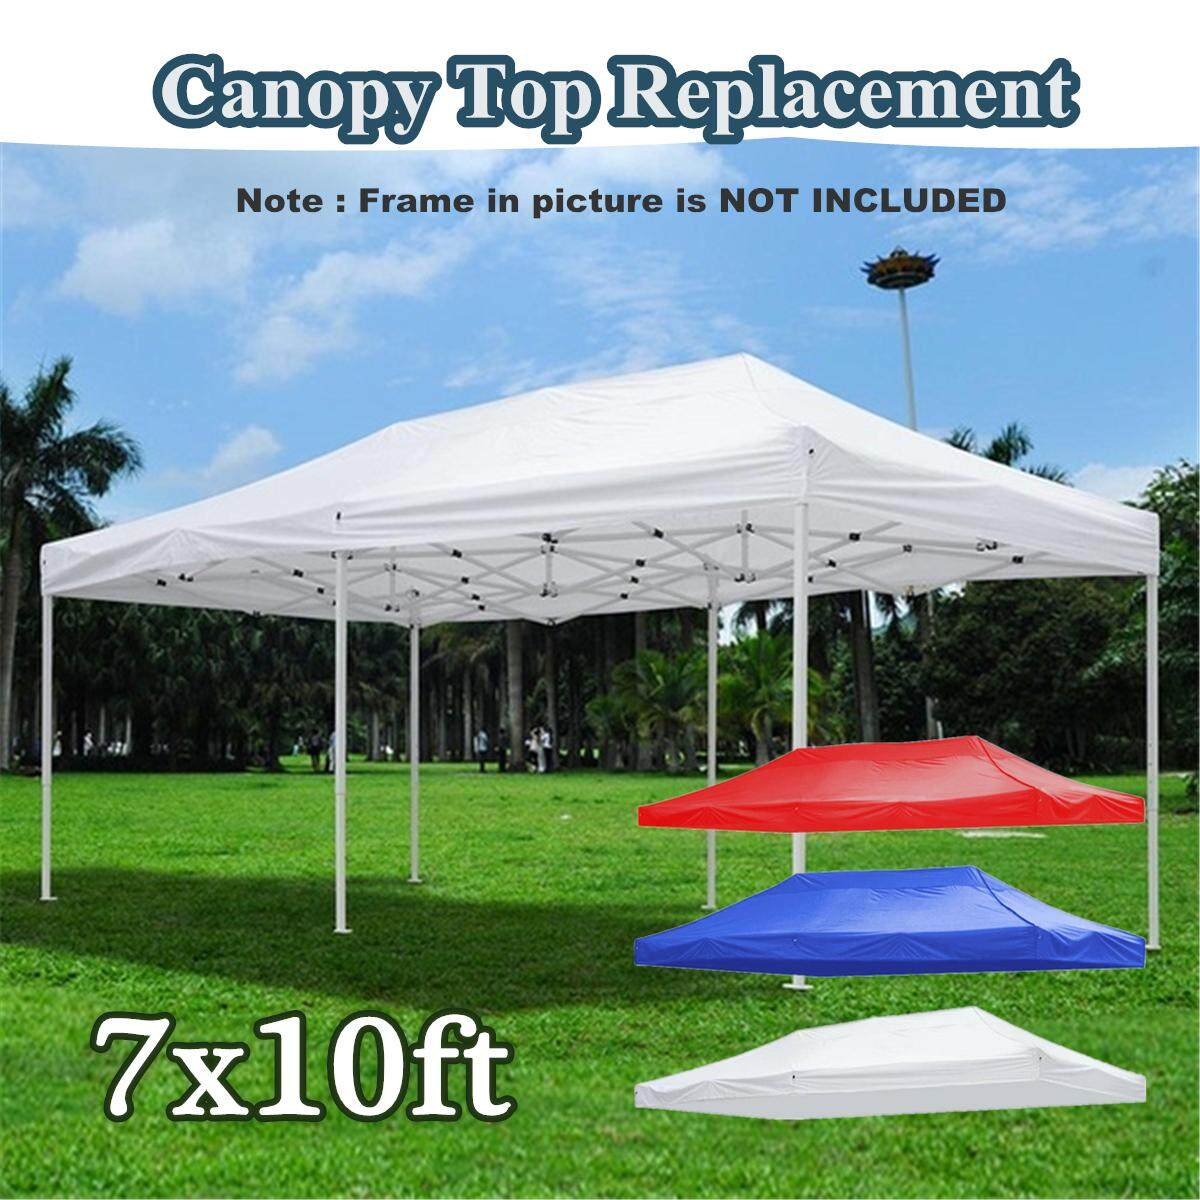 7x10ft Pop Up Canopy Top เปลี่ยนเต็นท์ลานศาลาที่ประกอบได้ตั้งกลางแจ้ง 420d ม่านบังแดด.